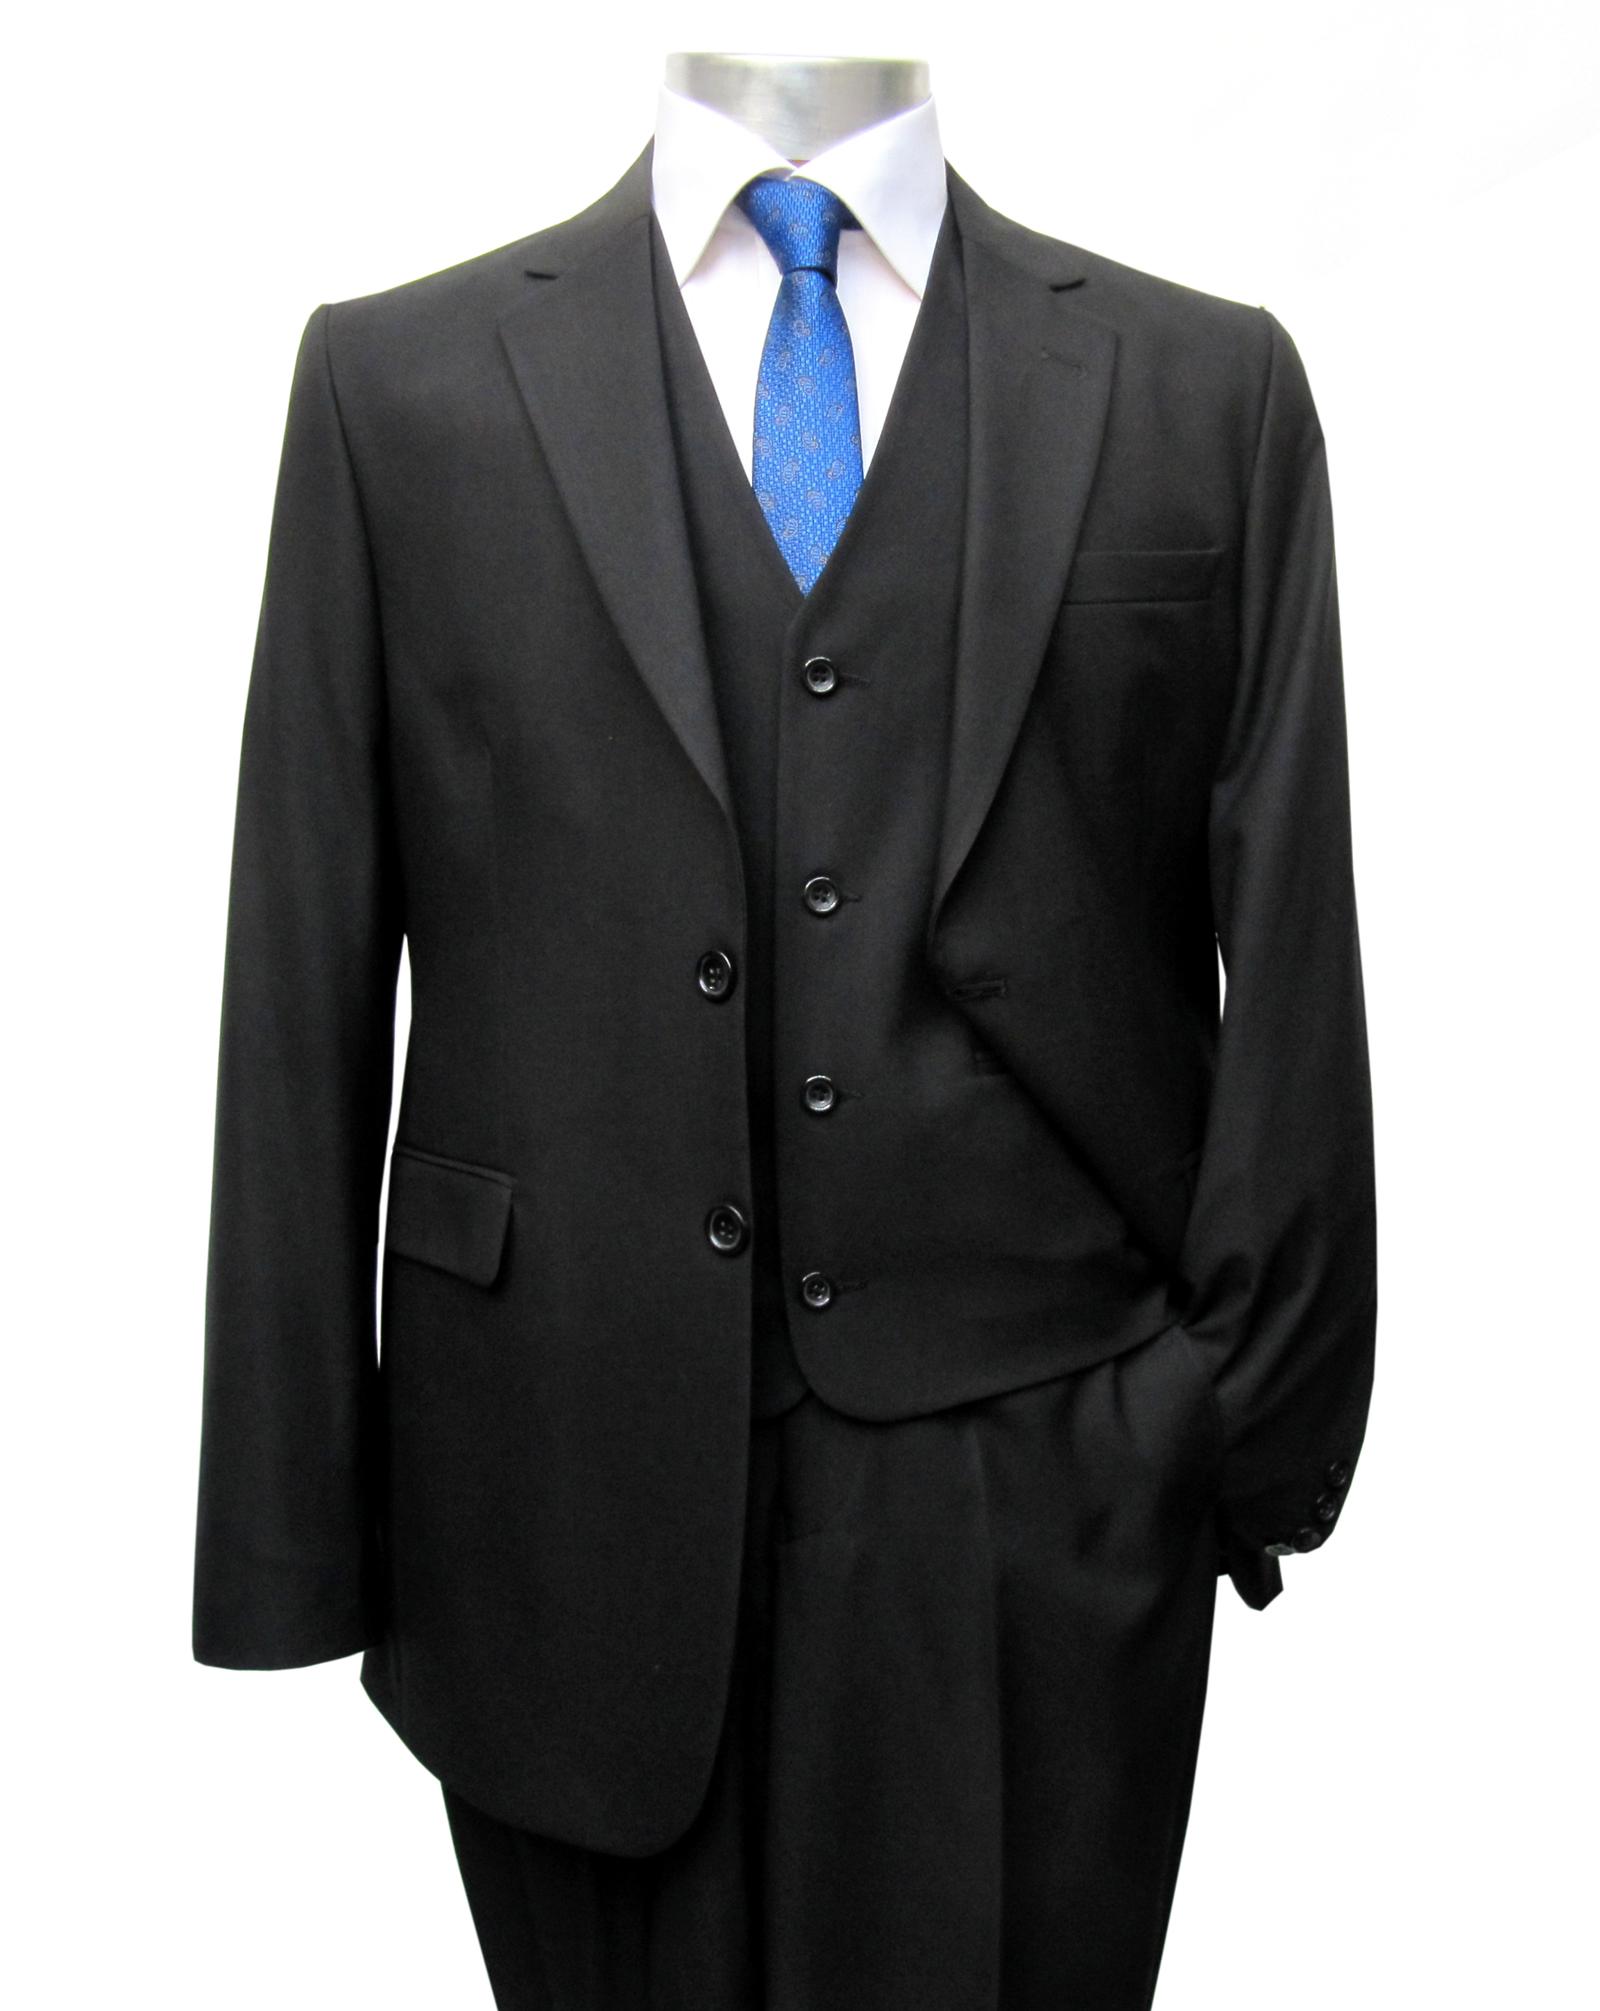 elegante muga herren anzug schwarz herrenausstatter k ln. Black Bedroom Furniture Sets. Home Design Ideas